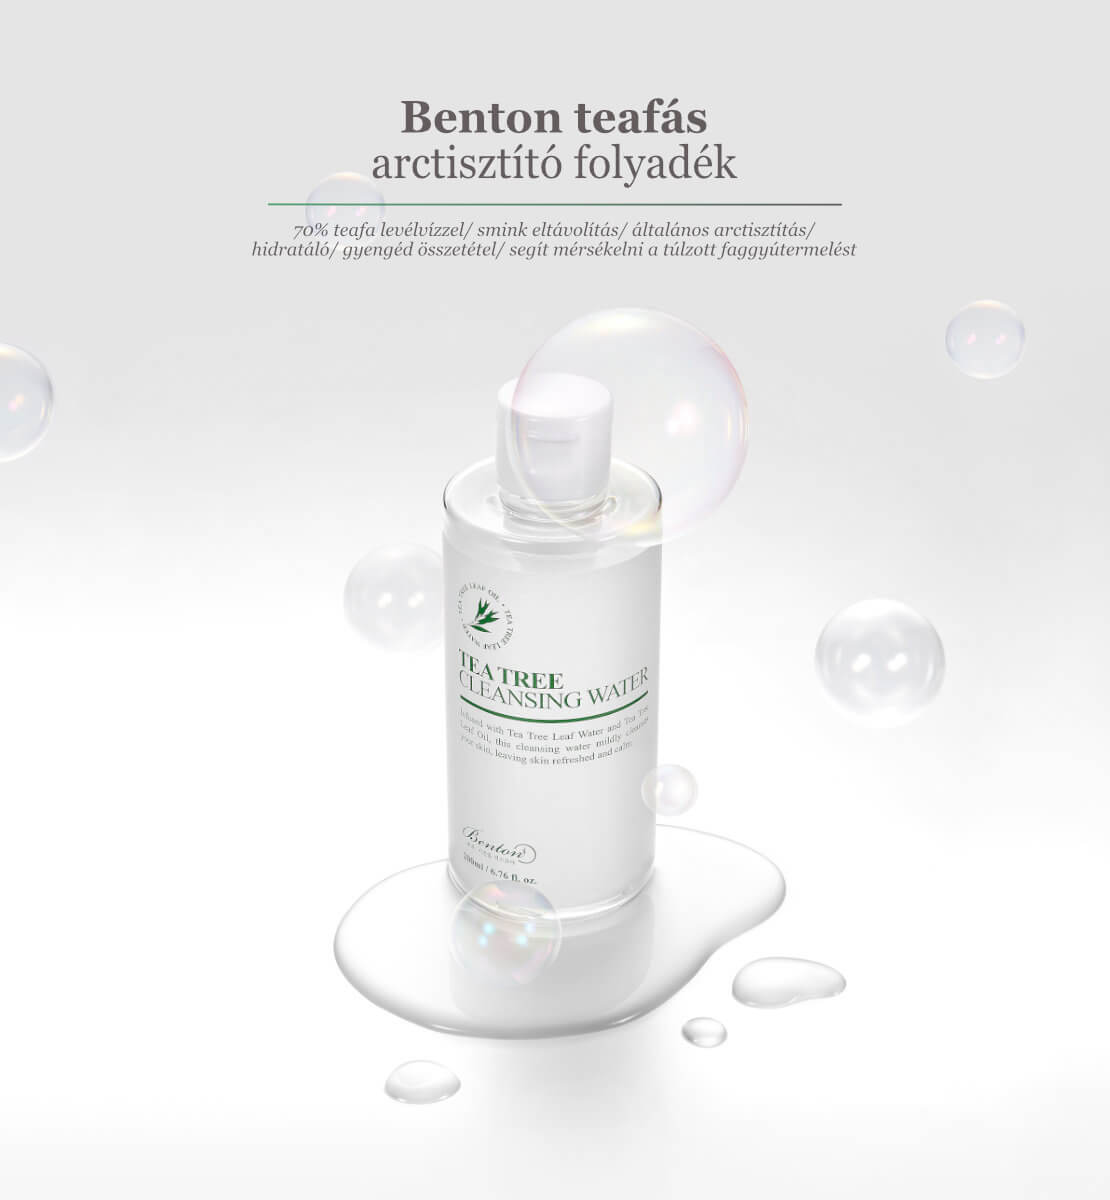 Benton-teafás-arctisztito-folyadek-leiras